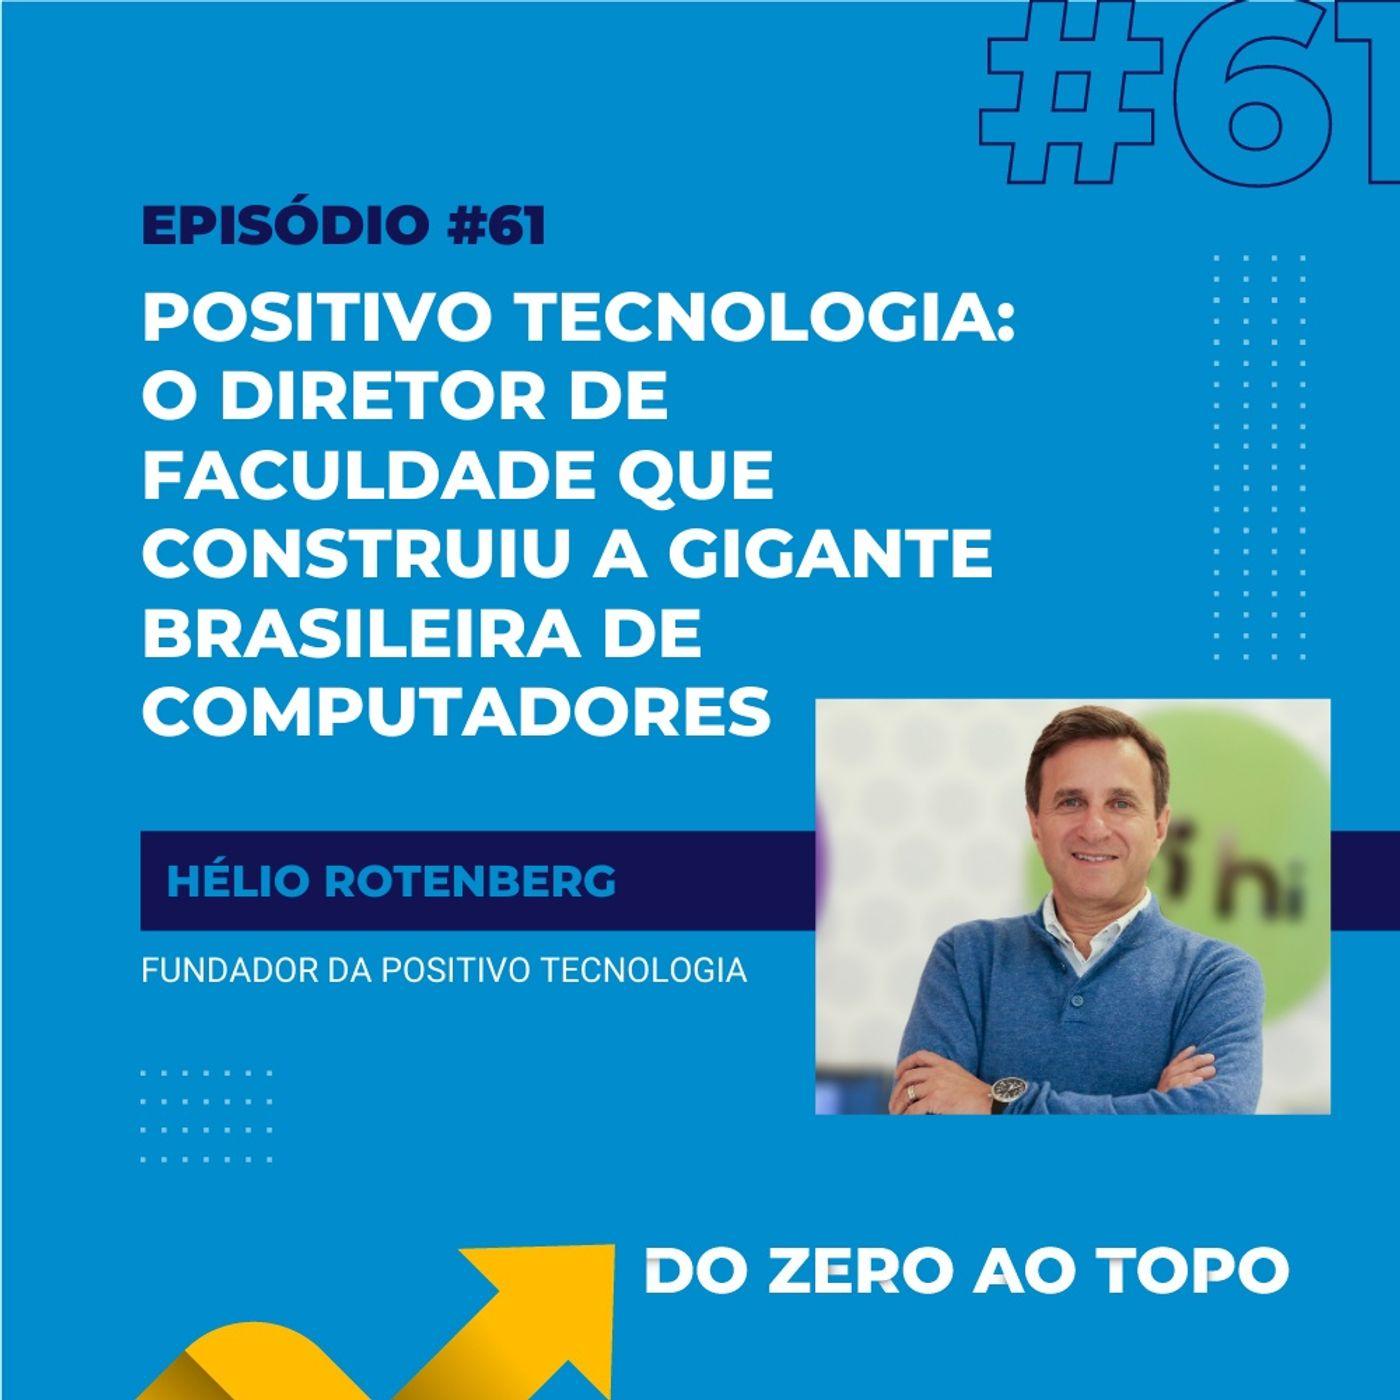 #61 - Positivo Tecnologia: o diretor de faculdade que construiu a gigante brasileira de computadores